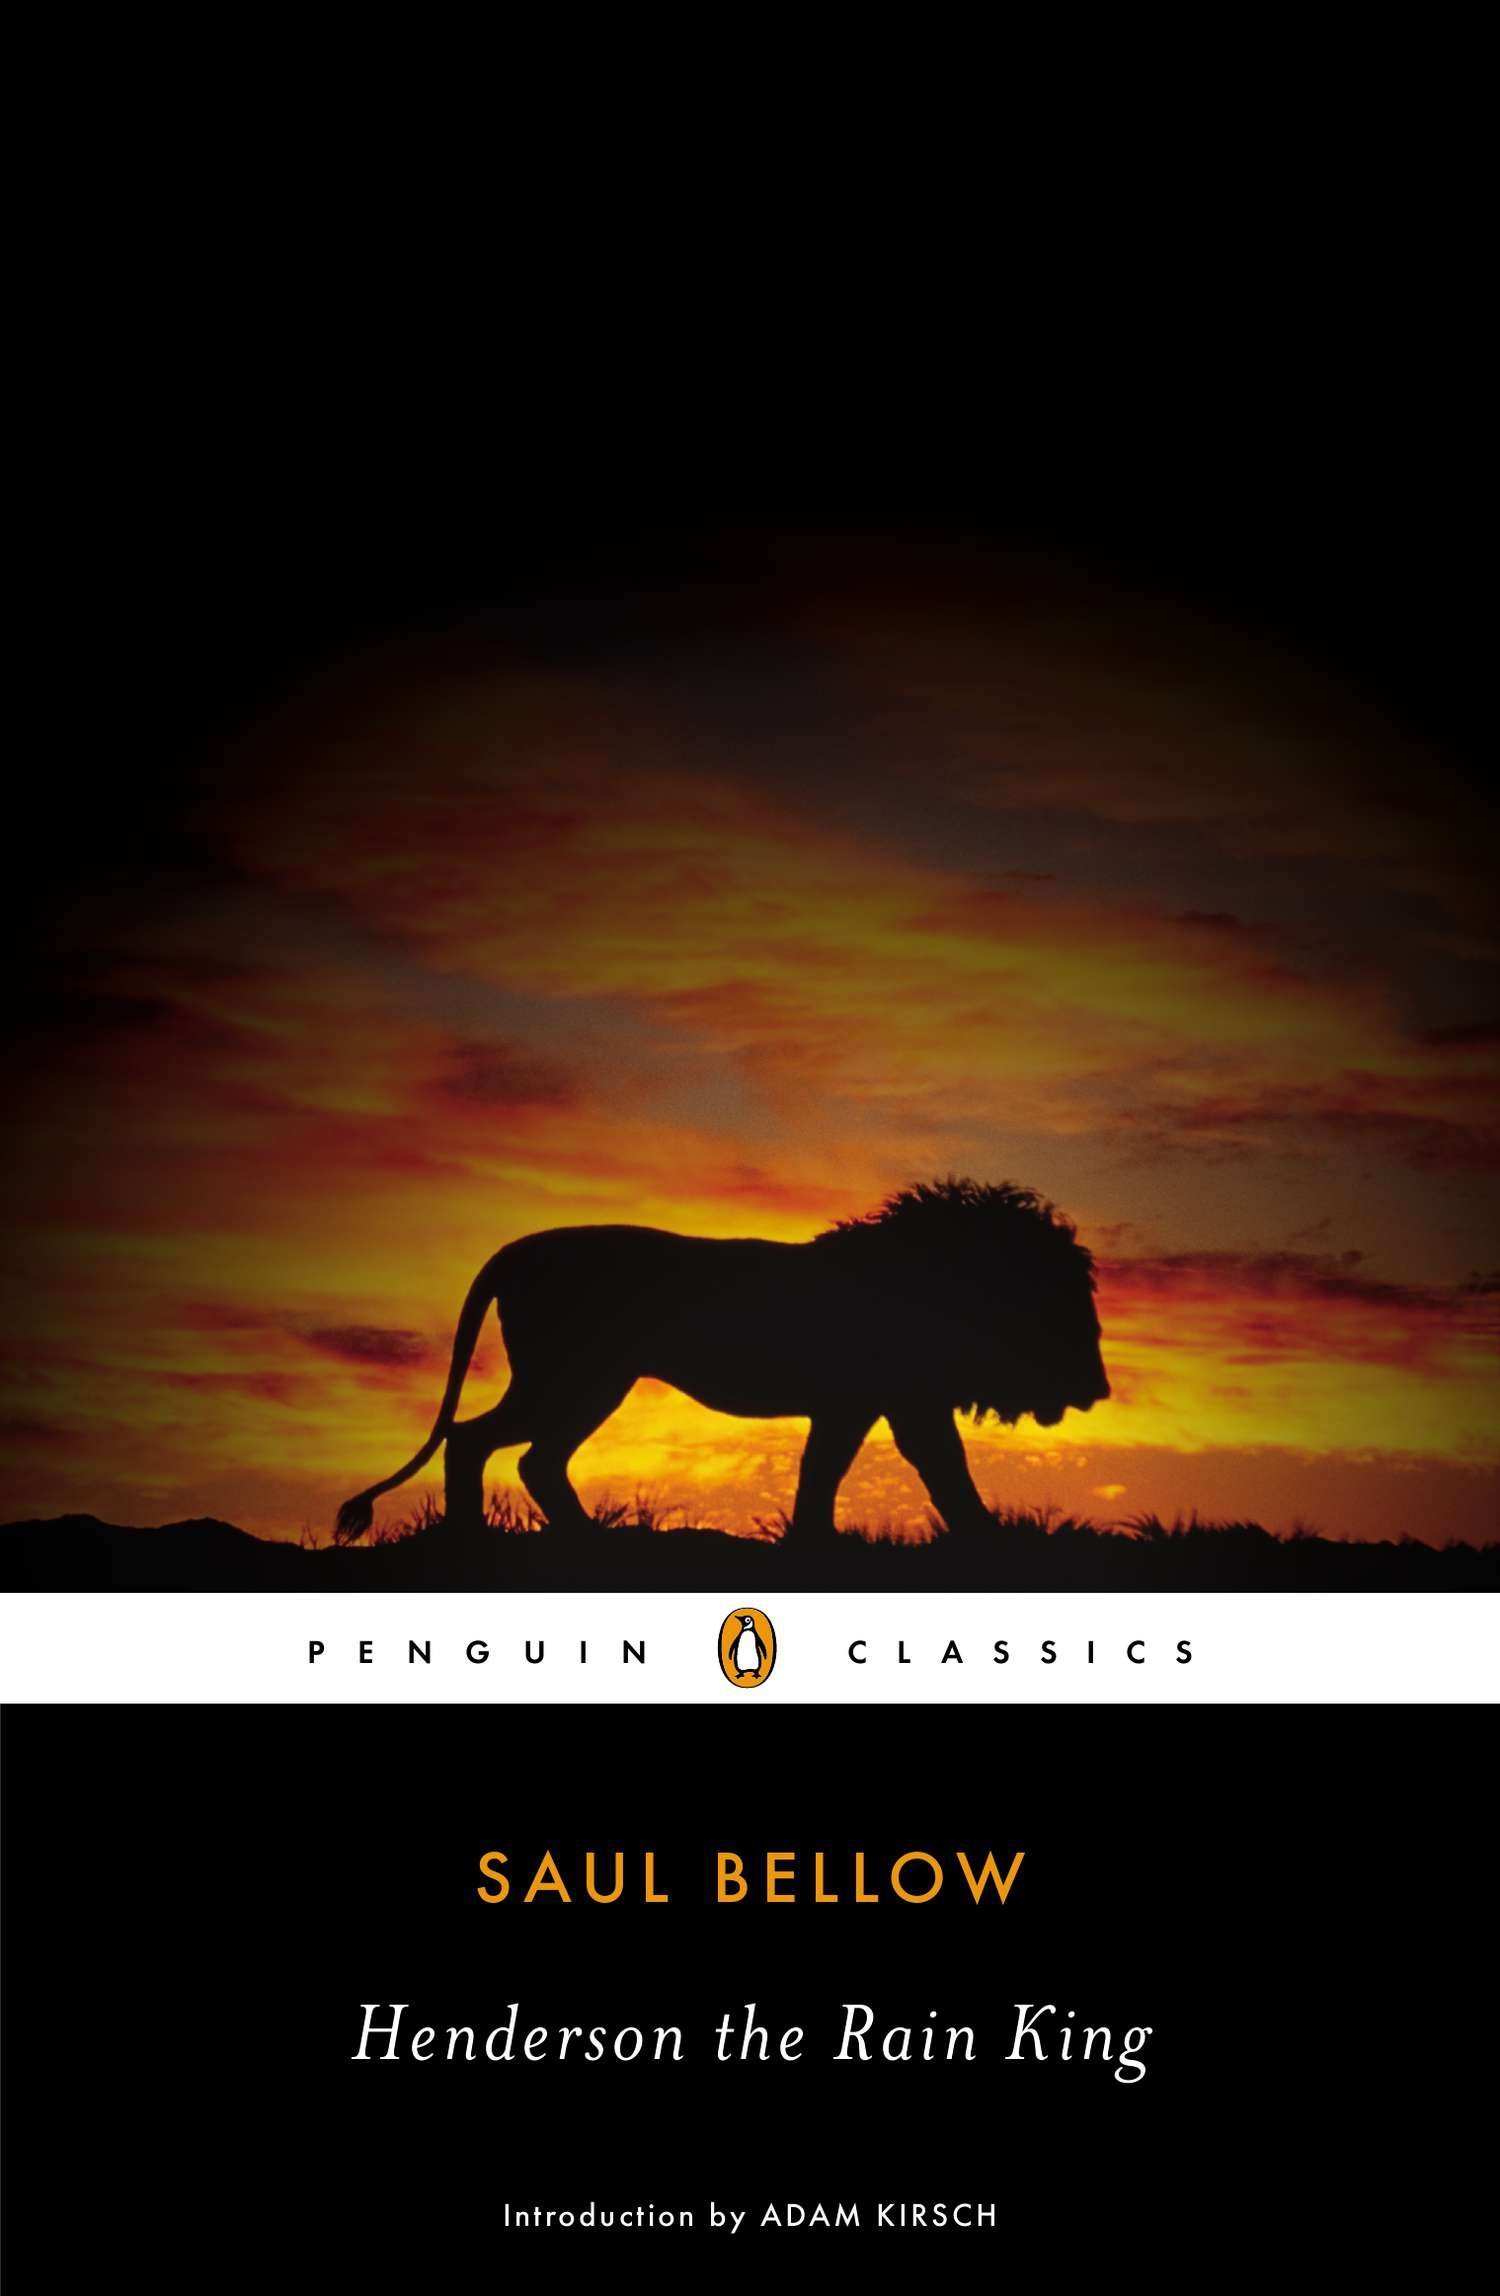 Amazon.com: Henderson the Rain King (Penguin Classics) (9780143105480): Saul  Bellow, Adam Kirsch: Books